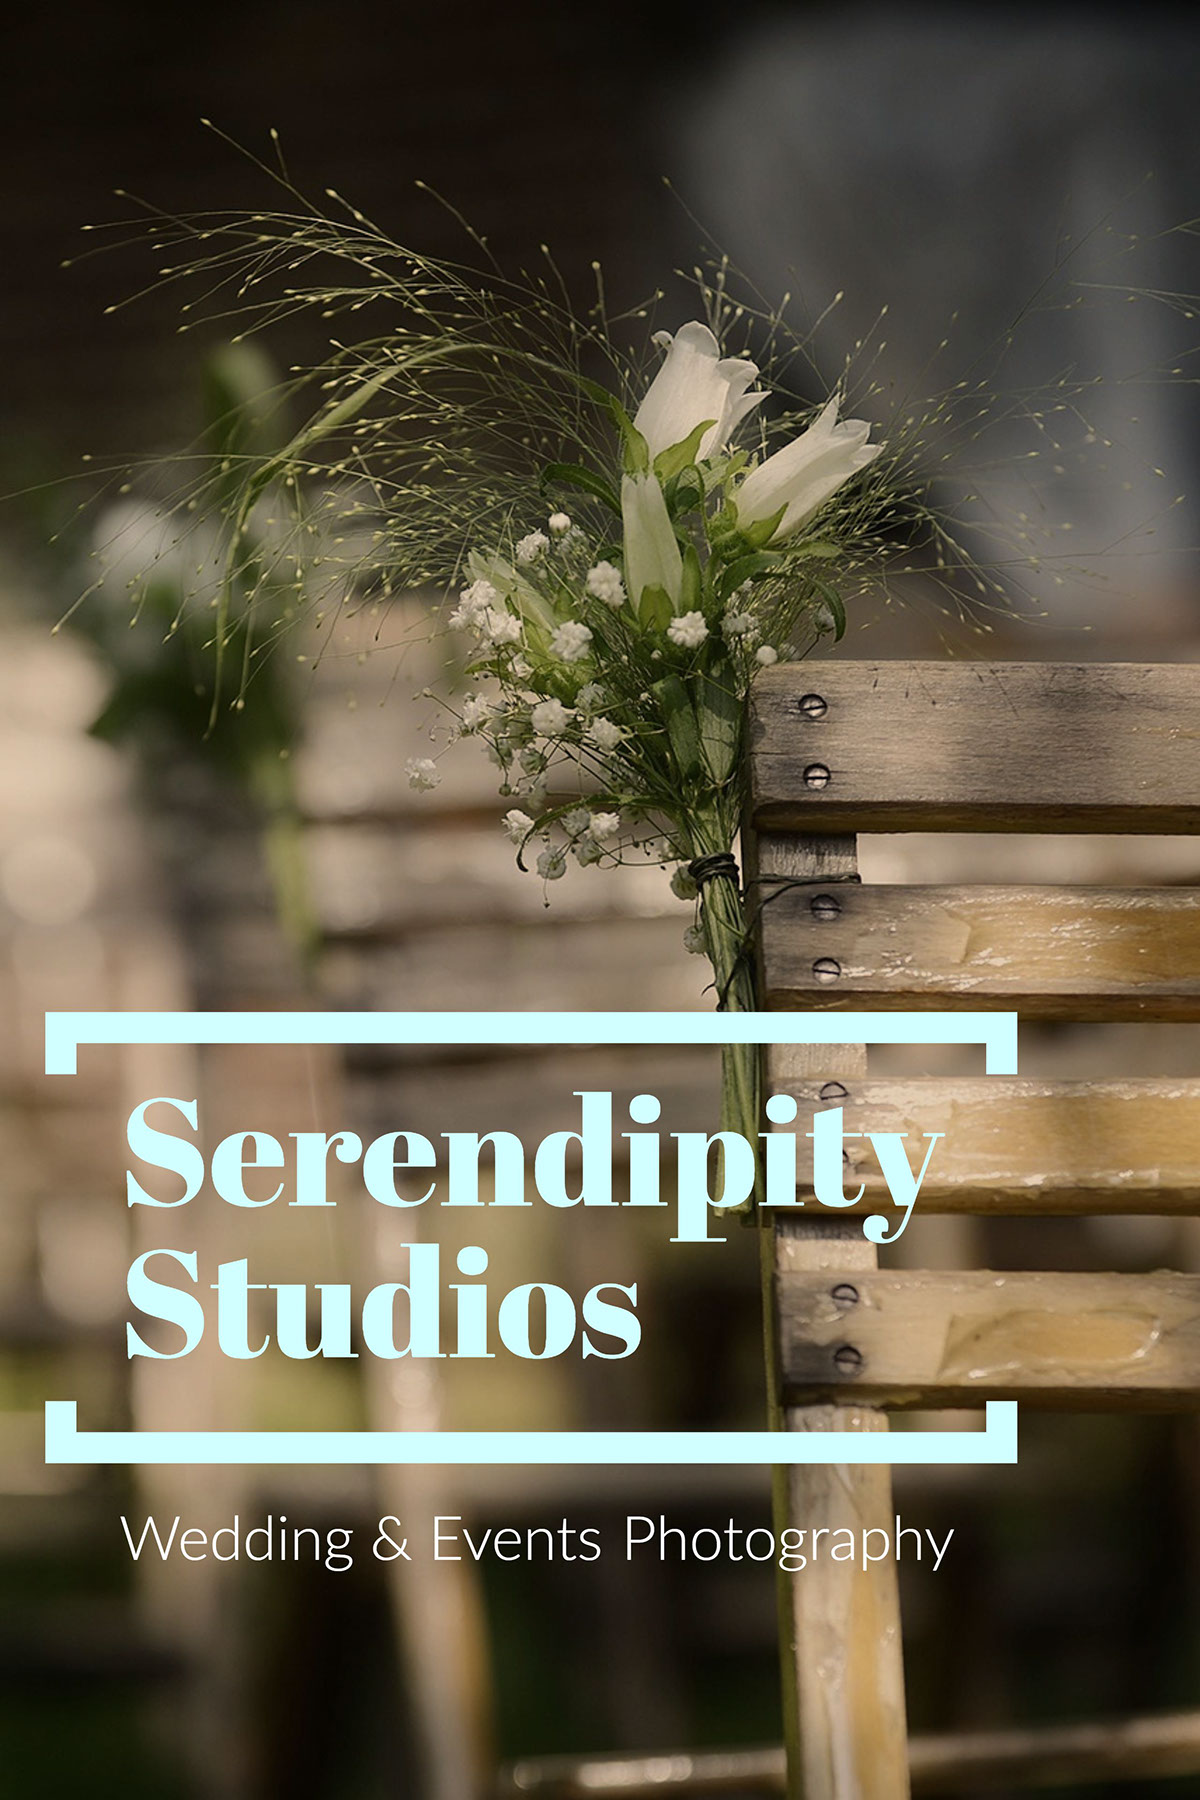 Serendipity Studios